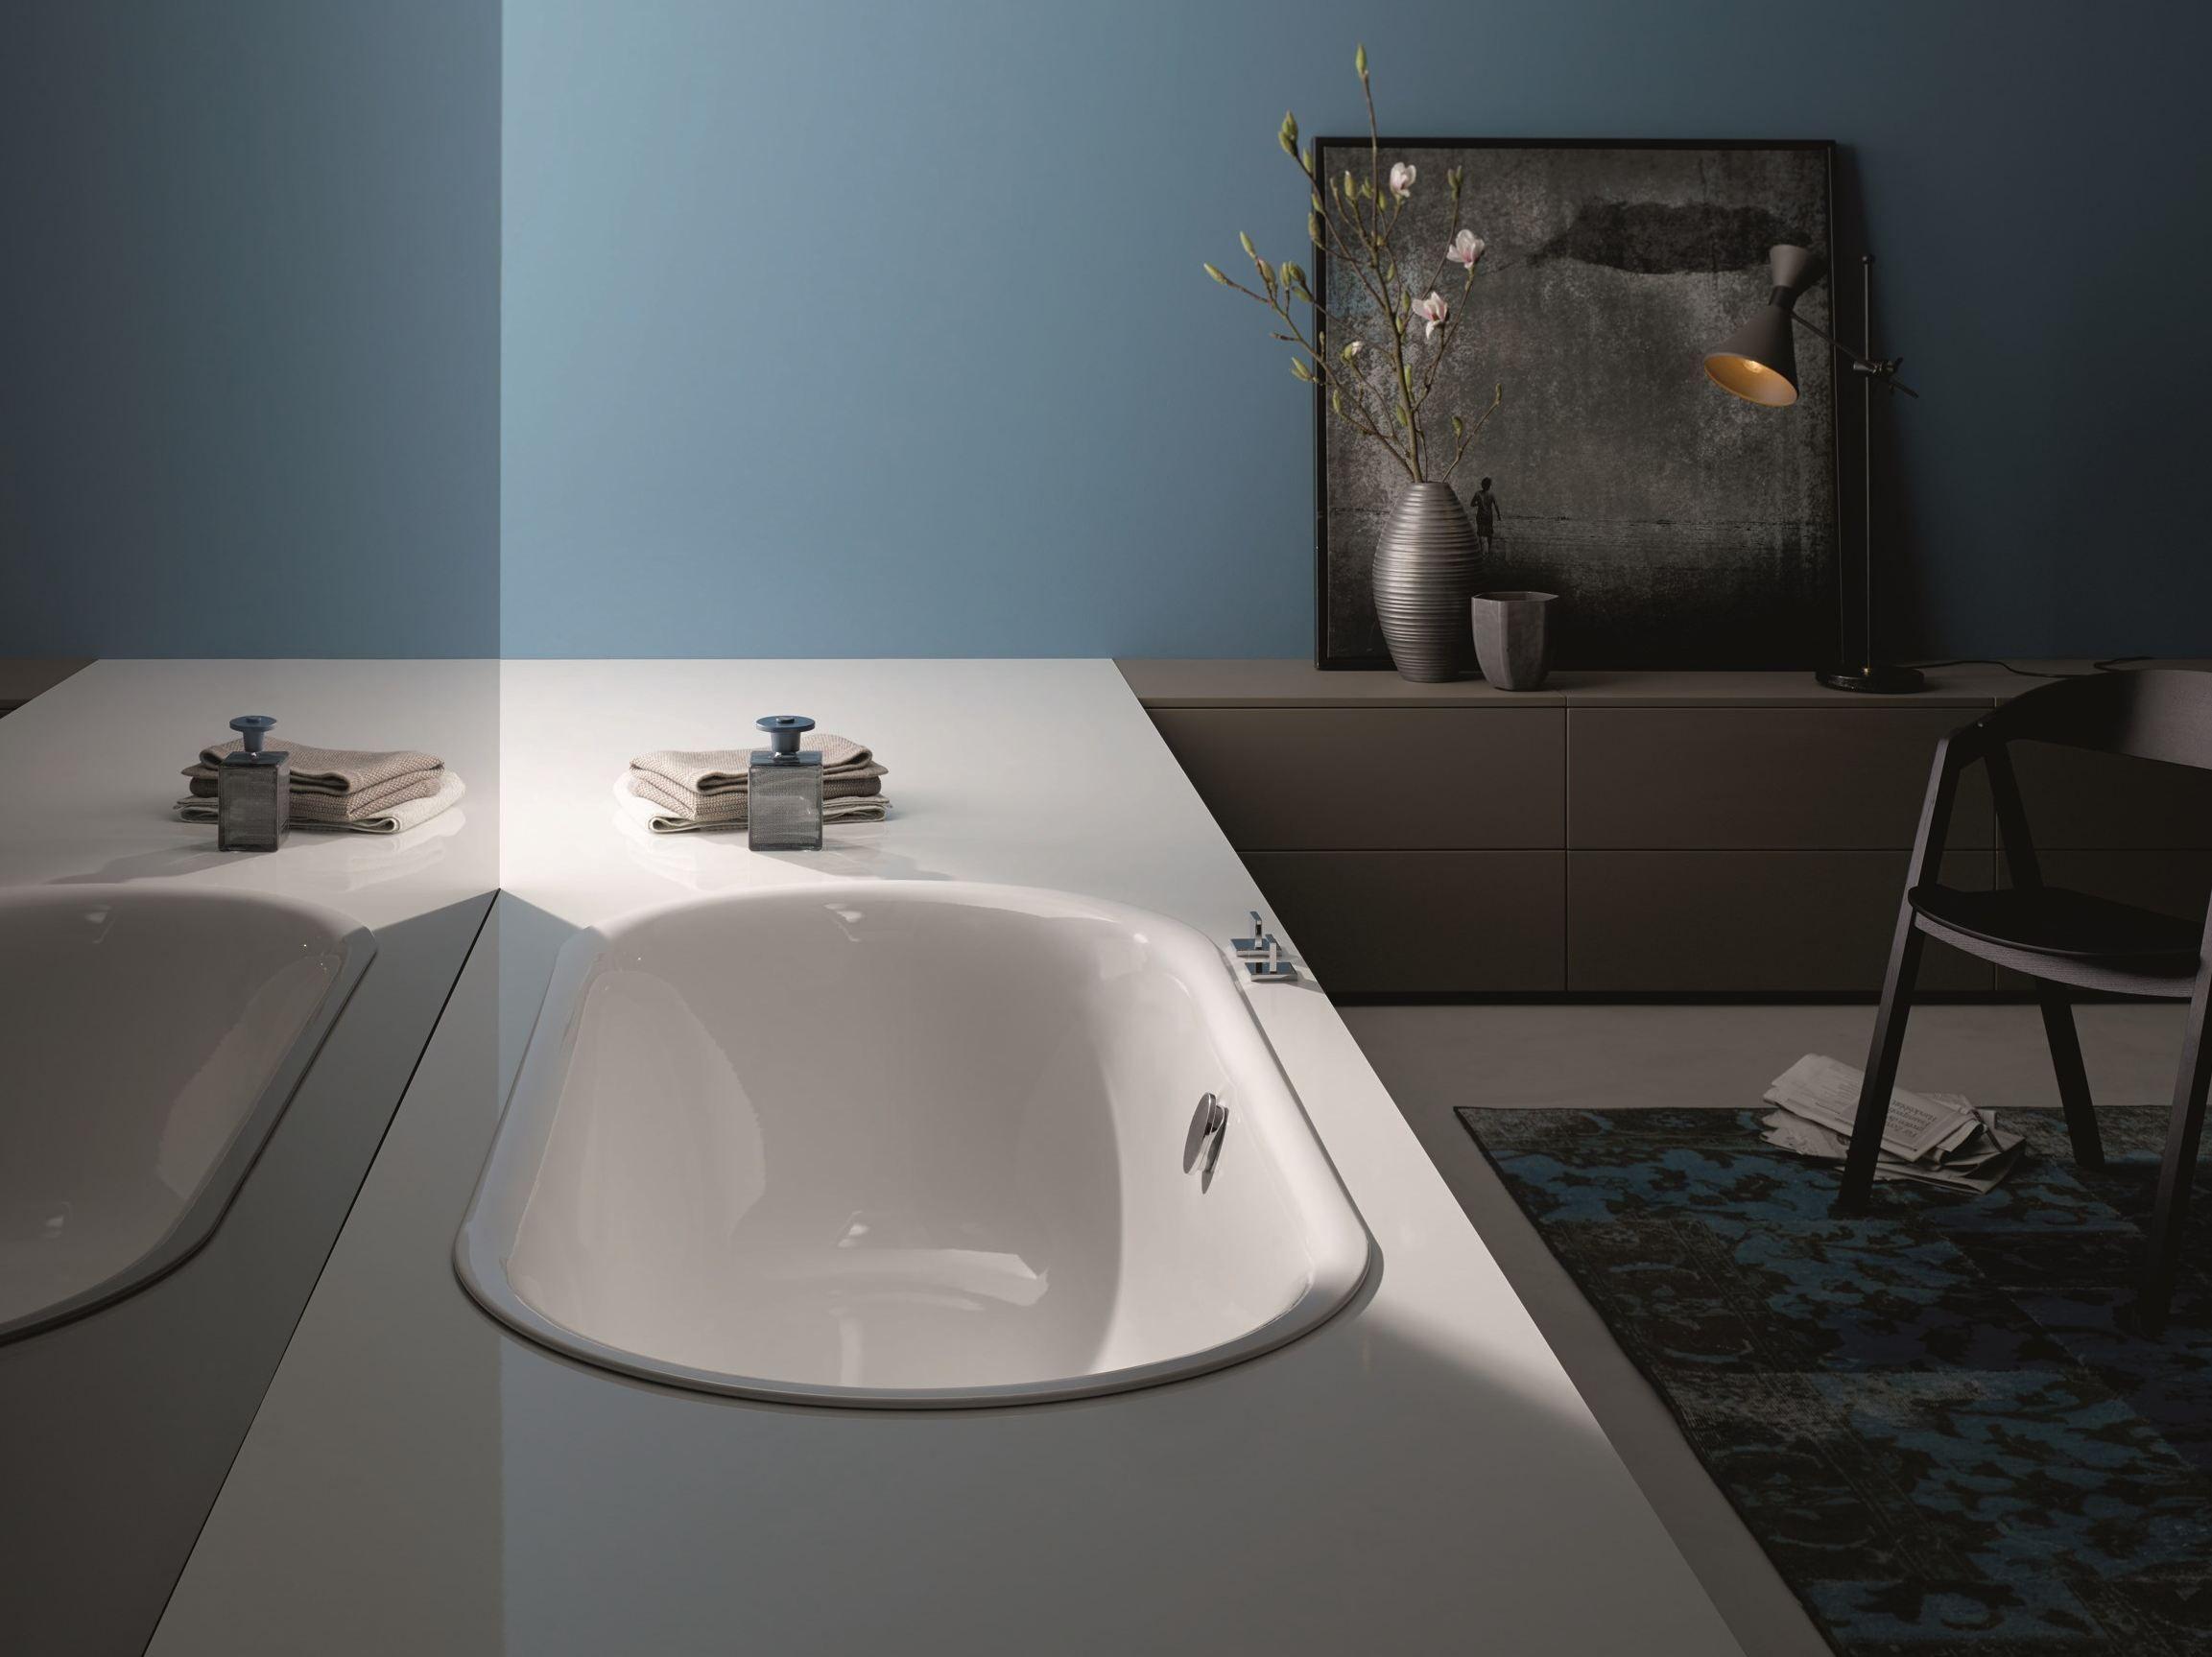 Oval Built In Bathtub Bettelux Oval By Bette Design Tesseraux Partner Built In Bathtub Bathtub Bathroom Inspiration